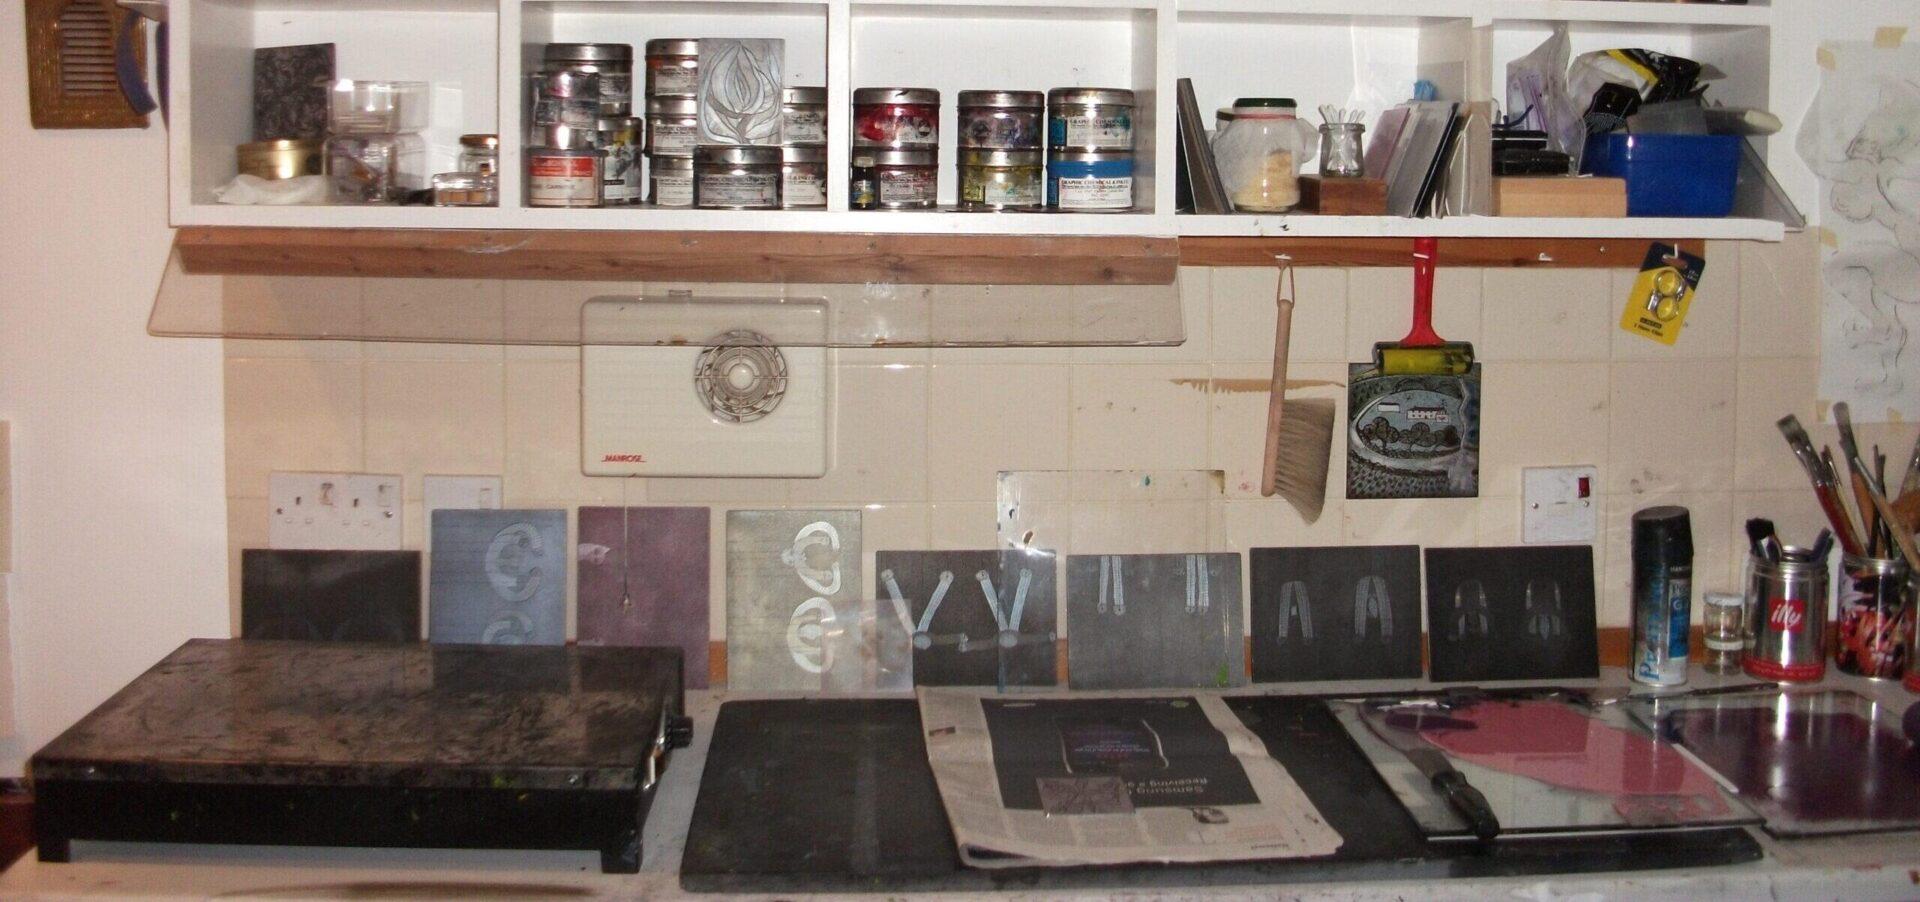 Studio shelves and equipment